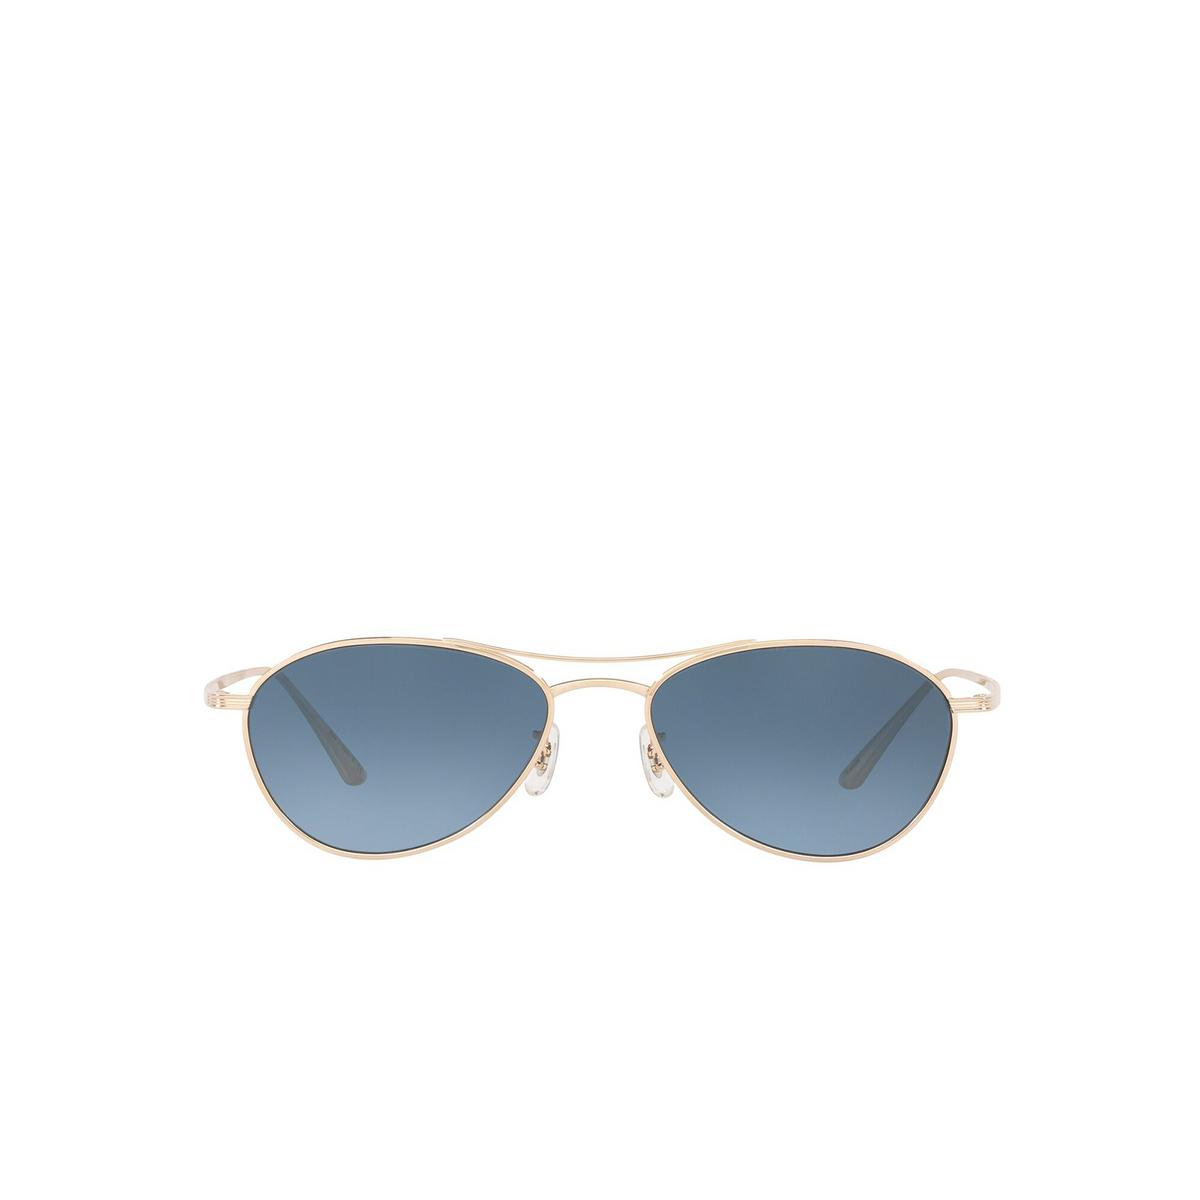 Oliver Peoples® Aviator Sunglasses: Aero La OV1245ST color Gold 5292Q8 - front view.